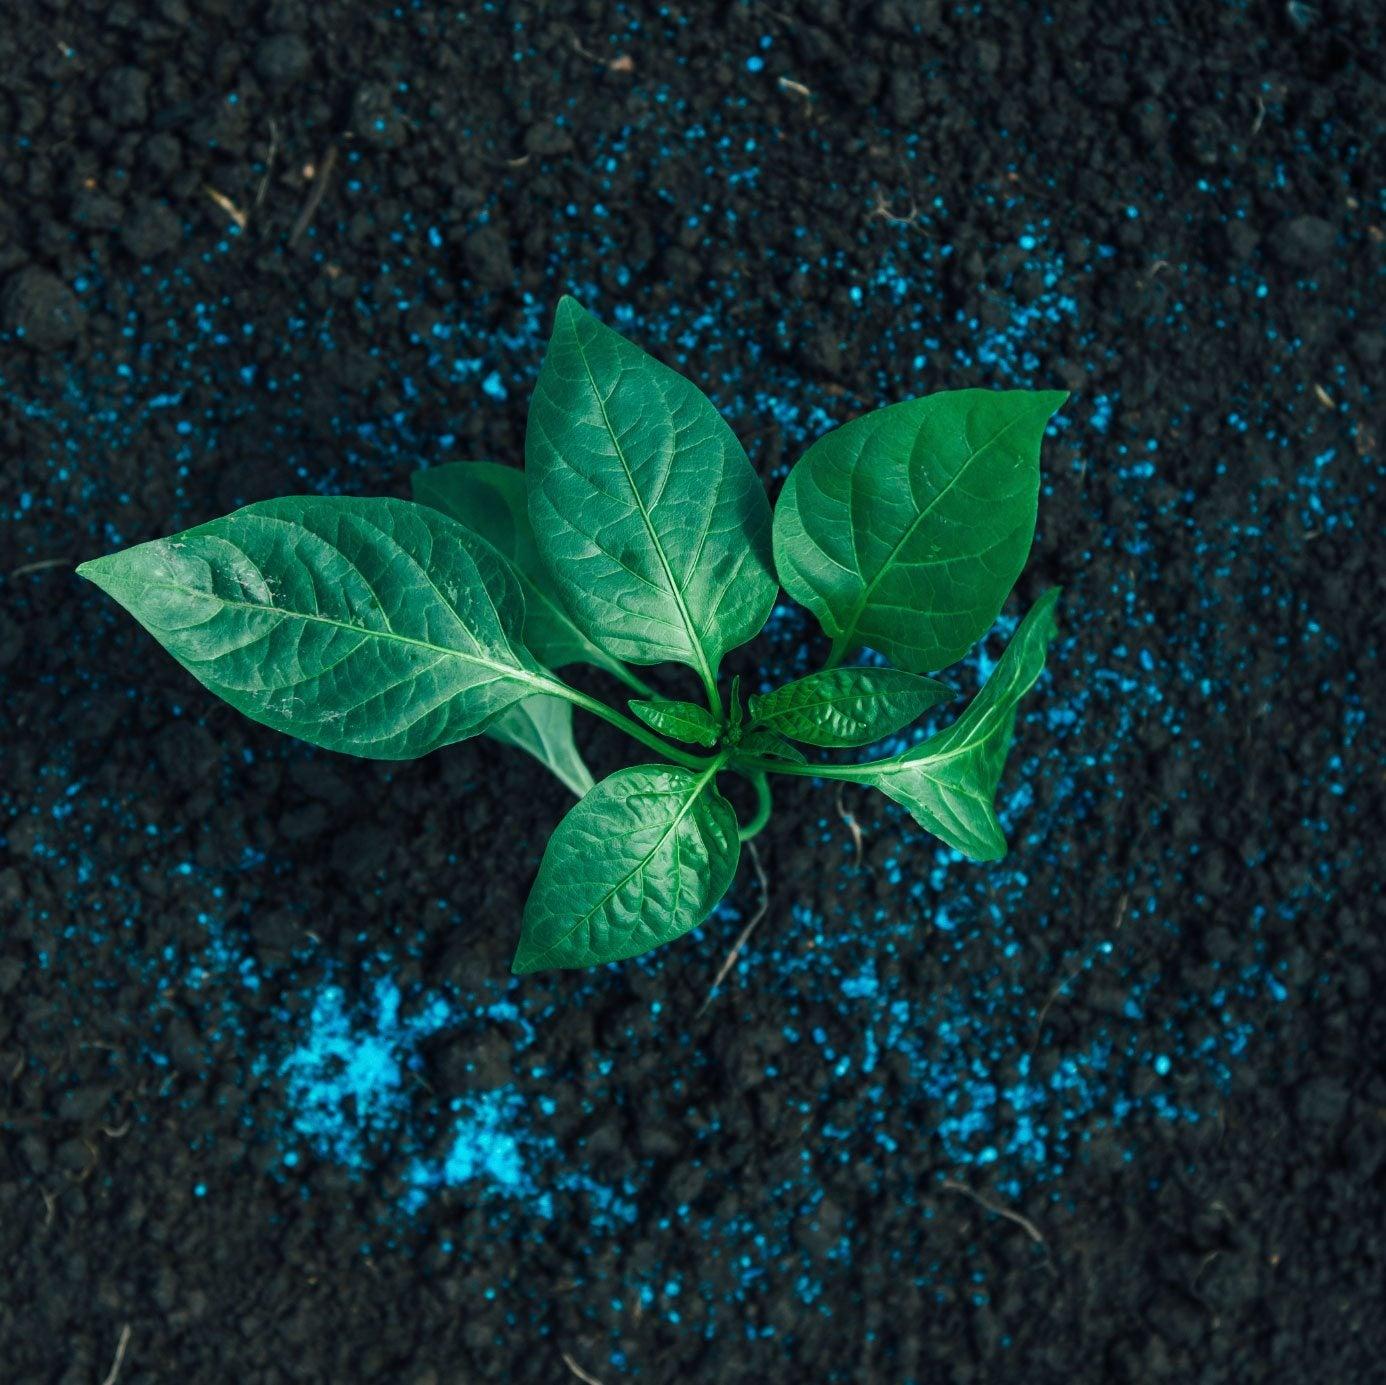 Fertilizing Pepper Plants What Is The Best Fertilizer For Pepper